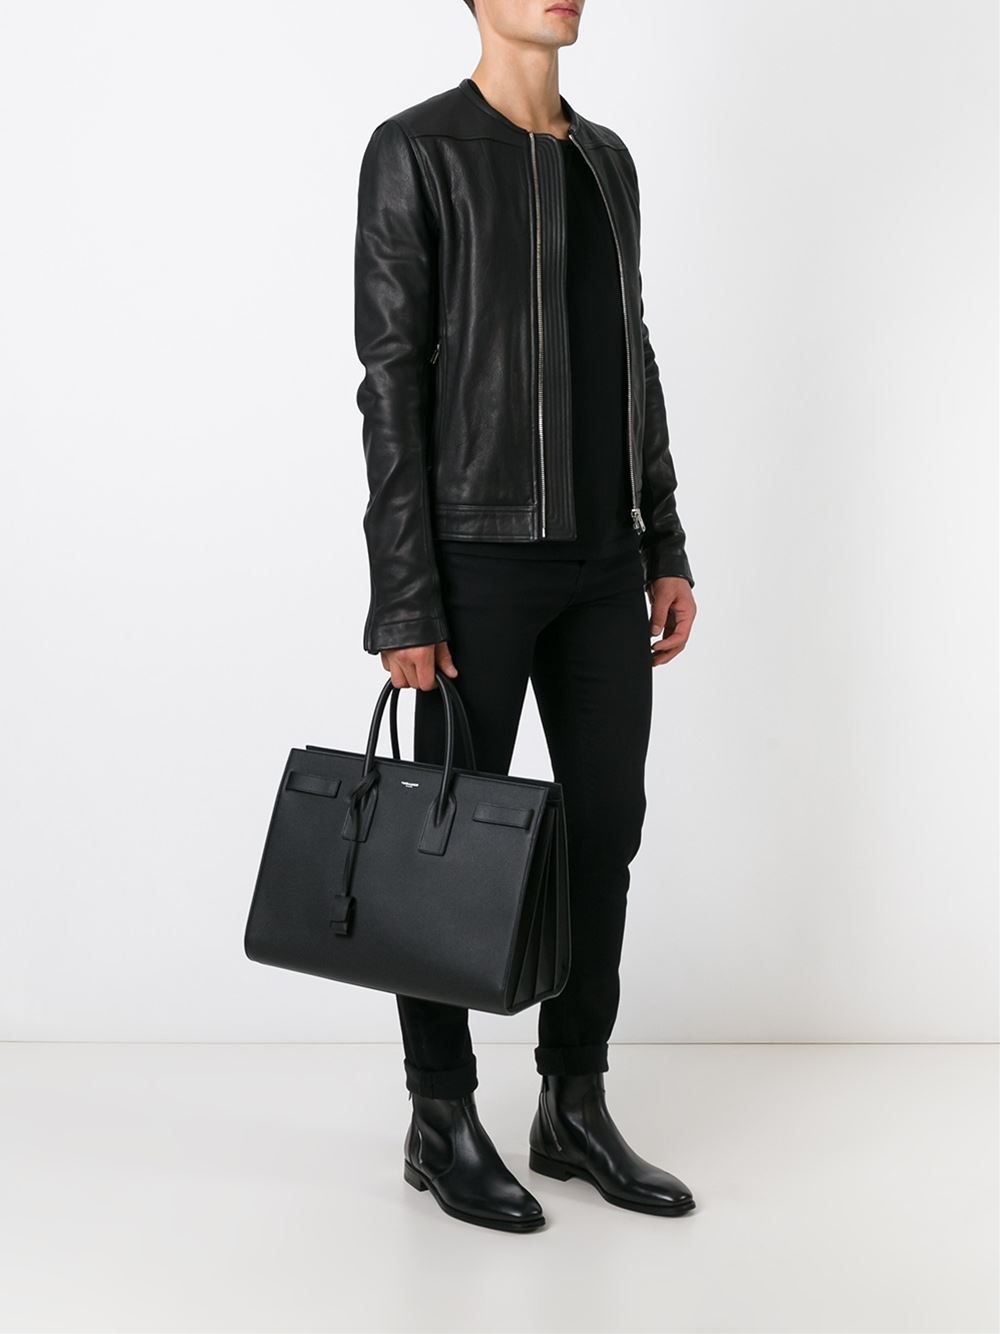 Saint Laurent Sac De Jour Tote In Black For Men Lyst